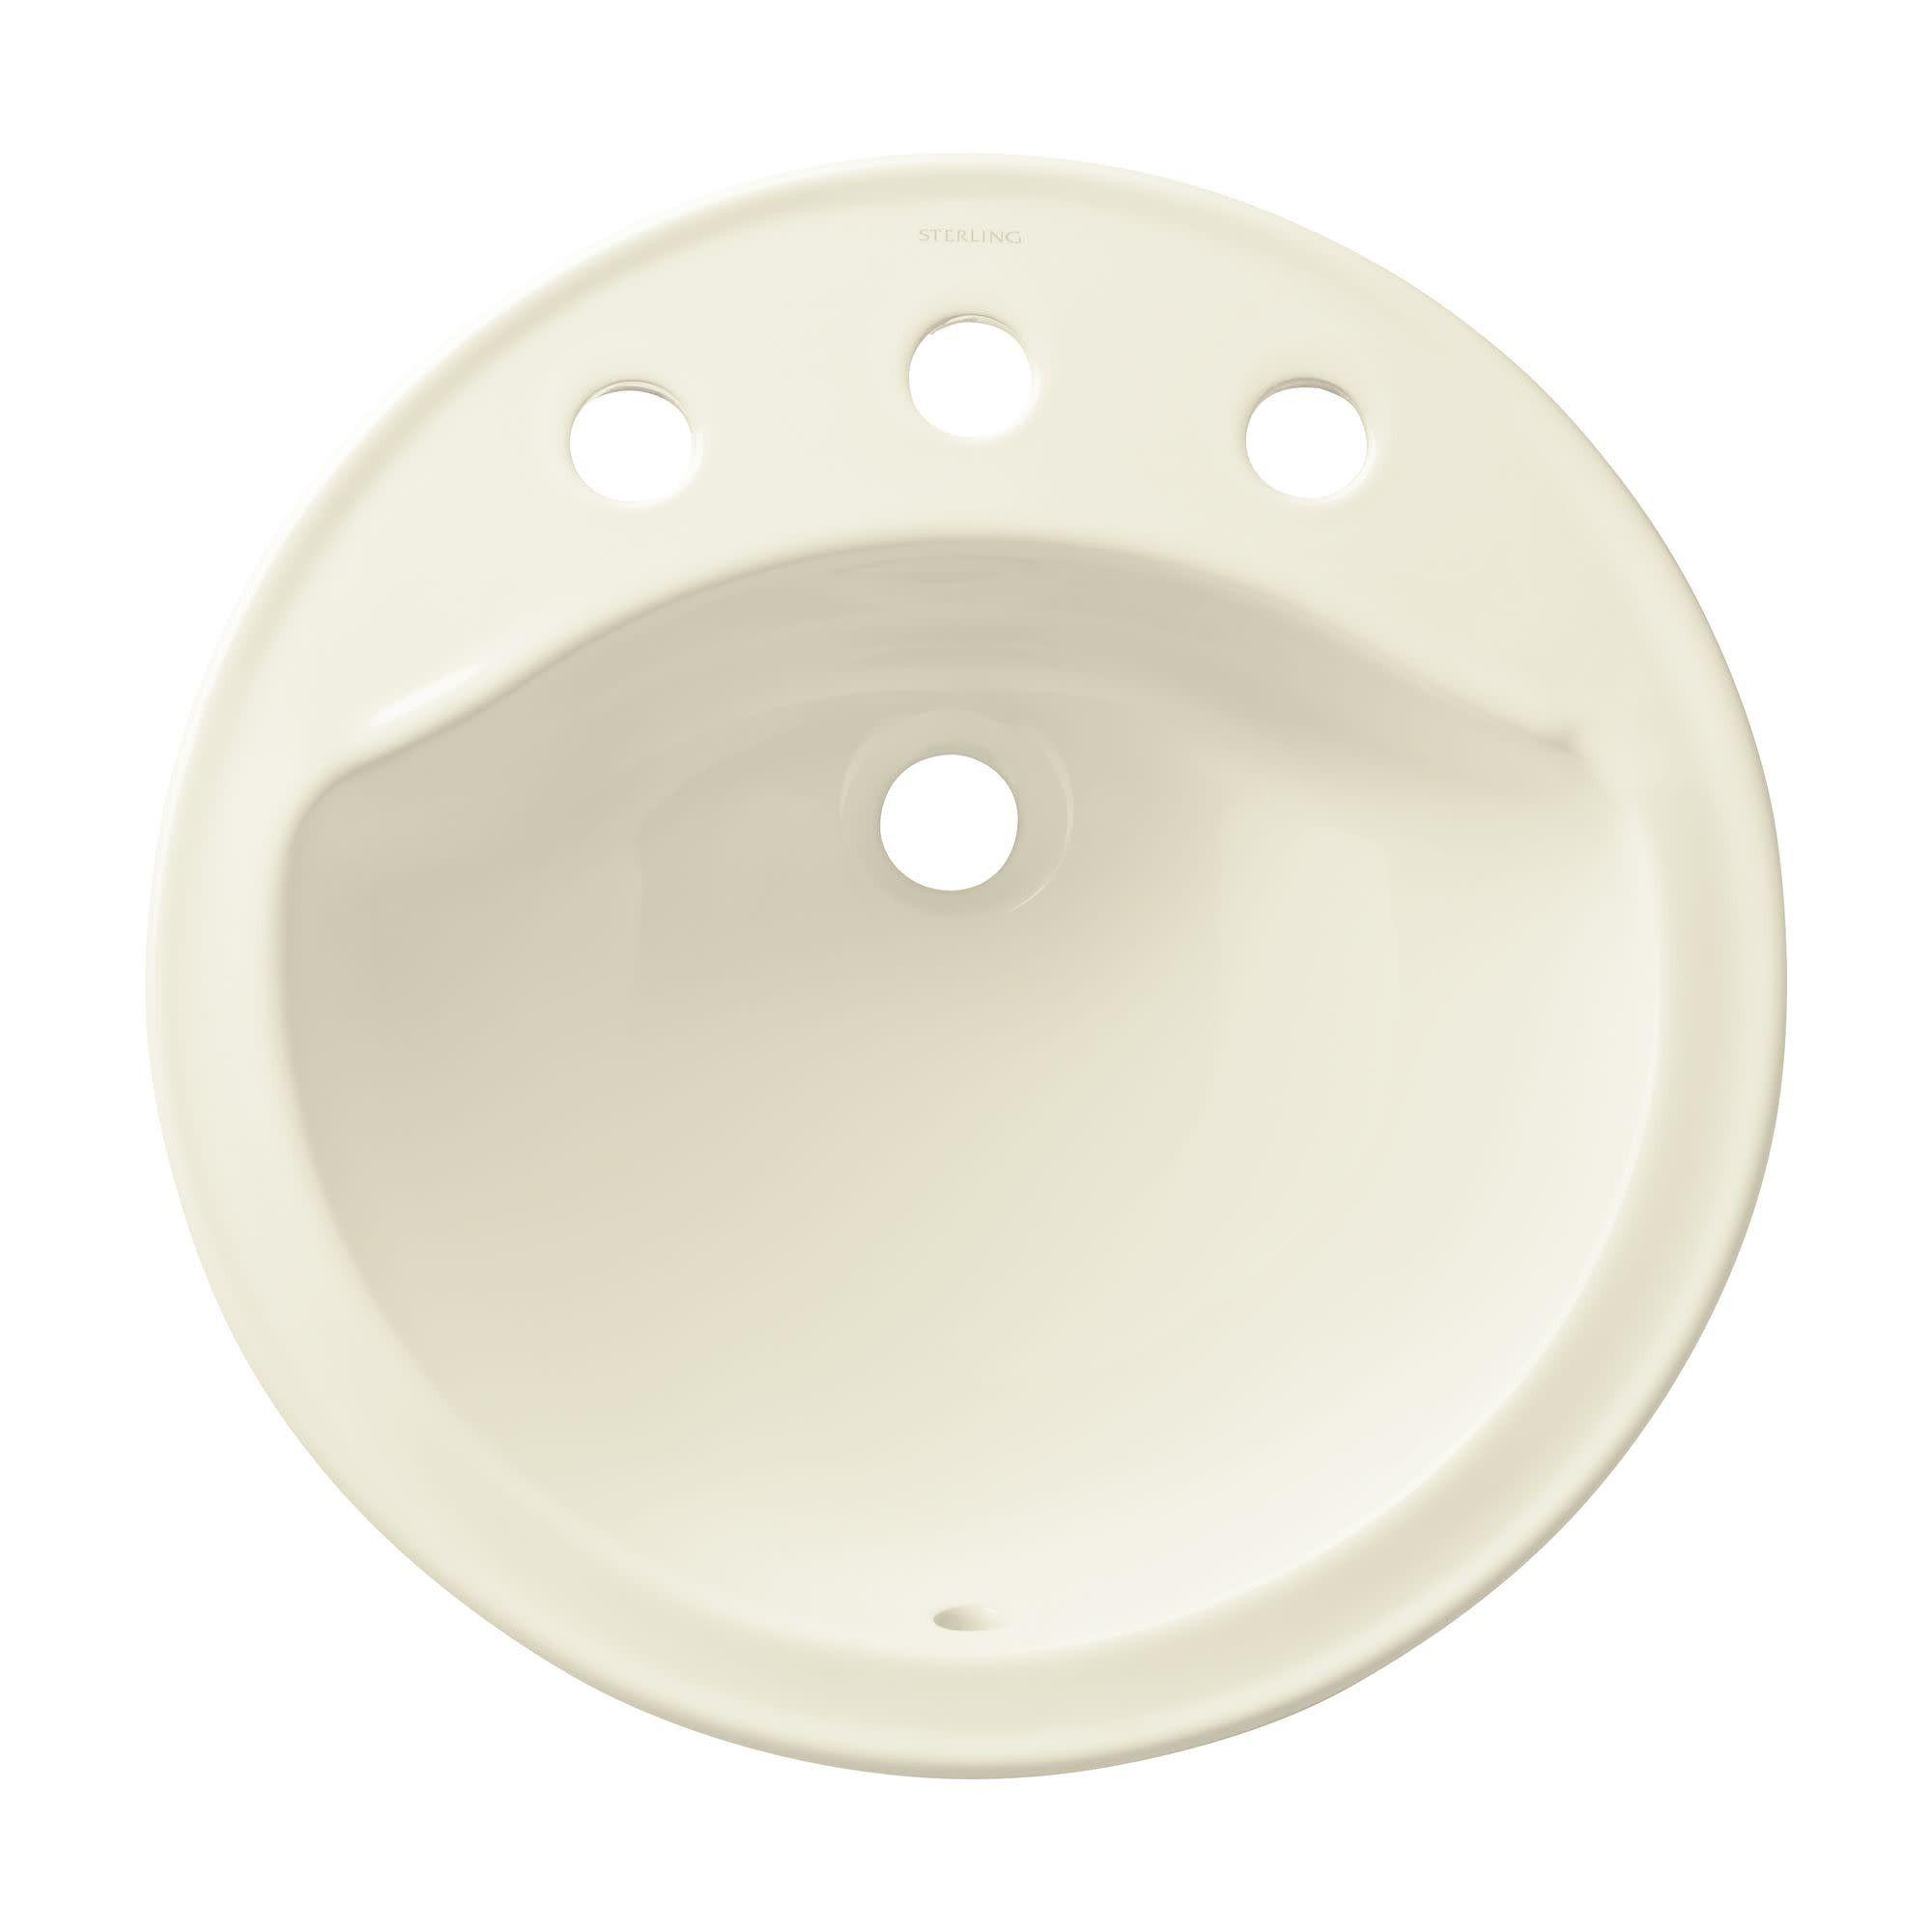 Sterling 441908 Modesto 19 Drop In Bathroom Sink Biscuit In 2019